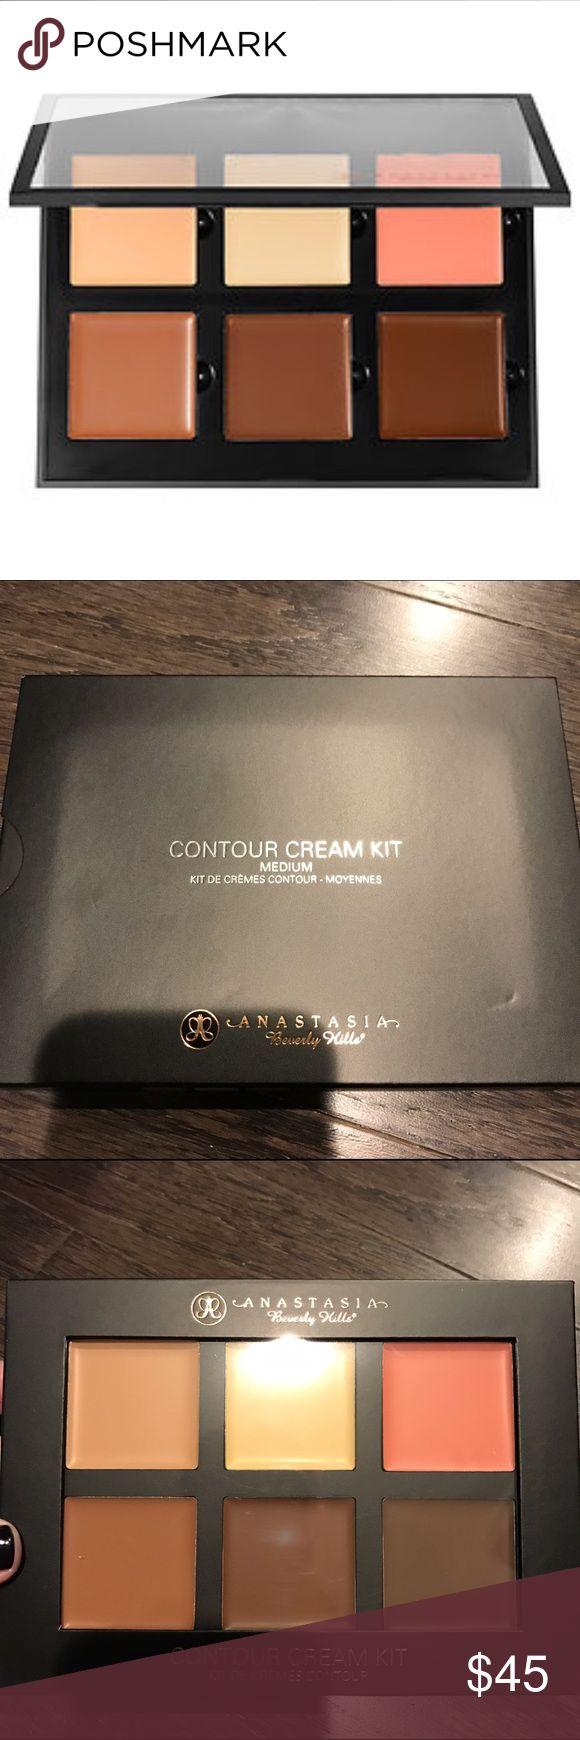 ❗️LAST ONE ❗️Anastasia Beauty Contour Kit For medium skin tones Sephora Makeup